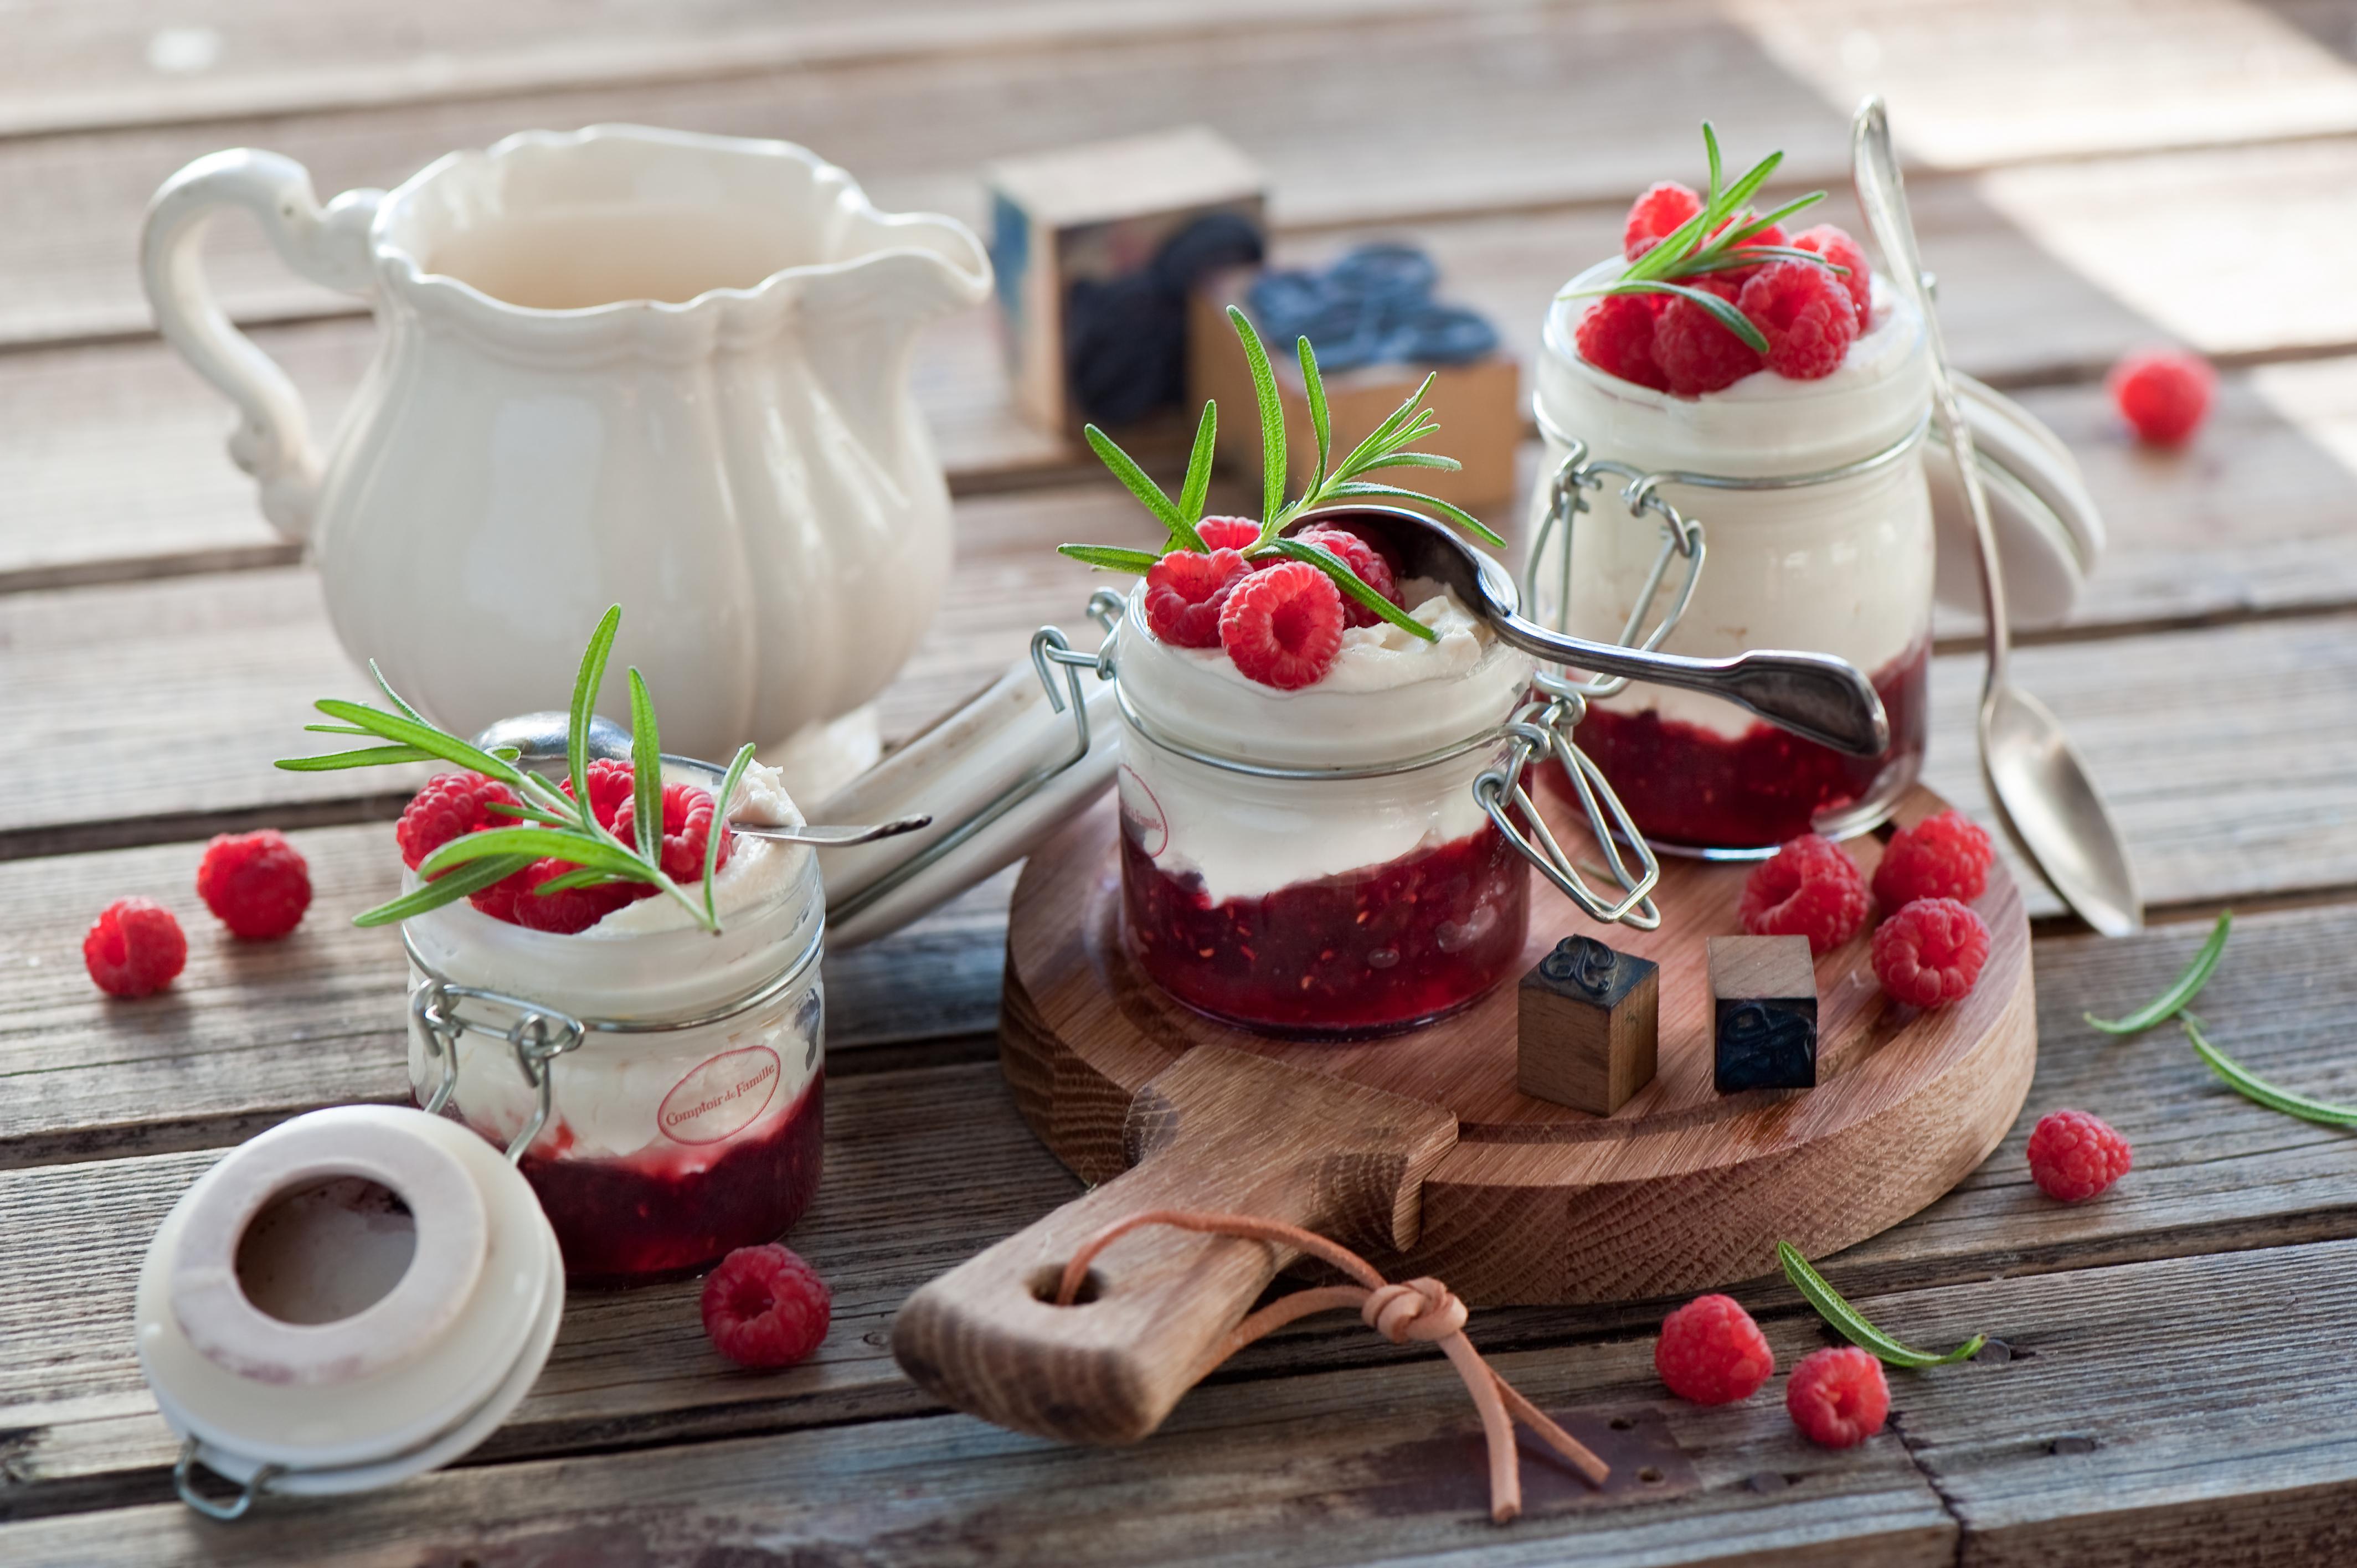 еда чай малина food tea raspberry  № 1100780 загрузить